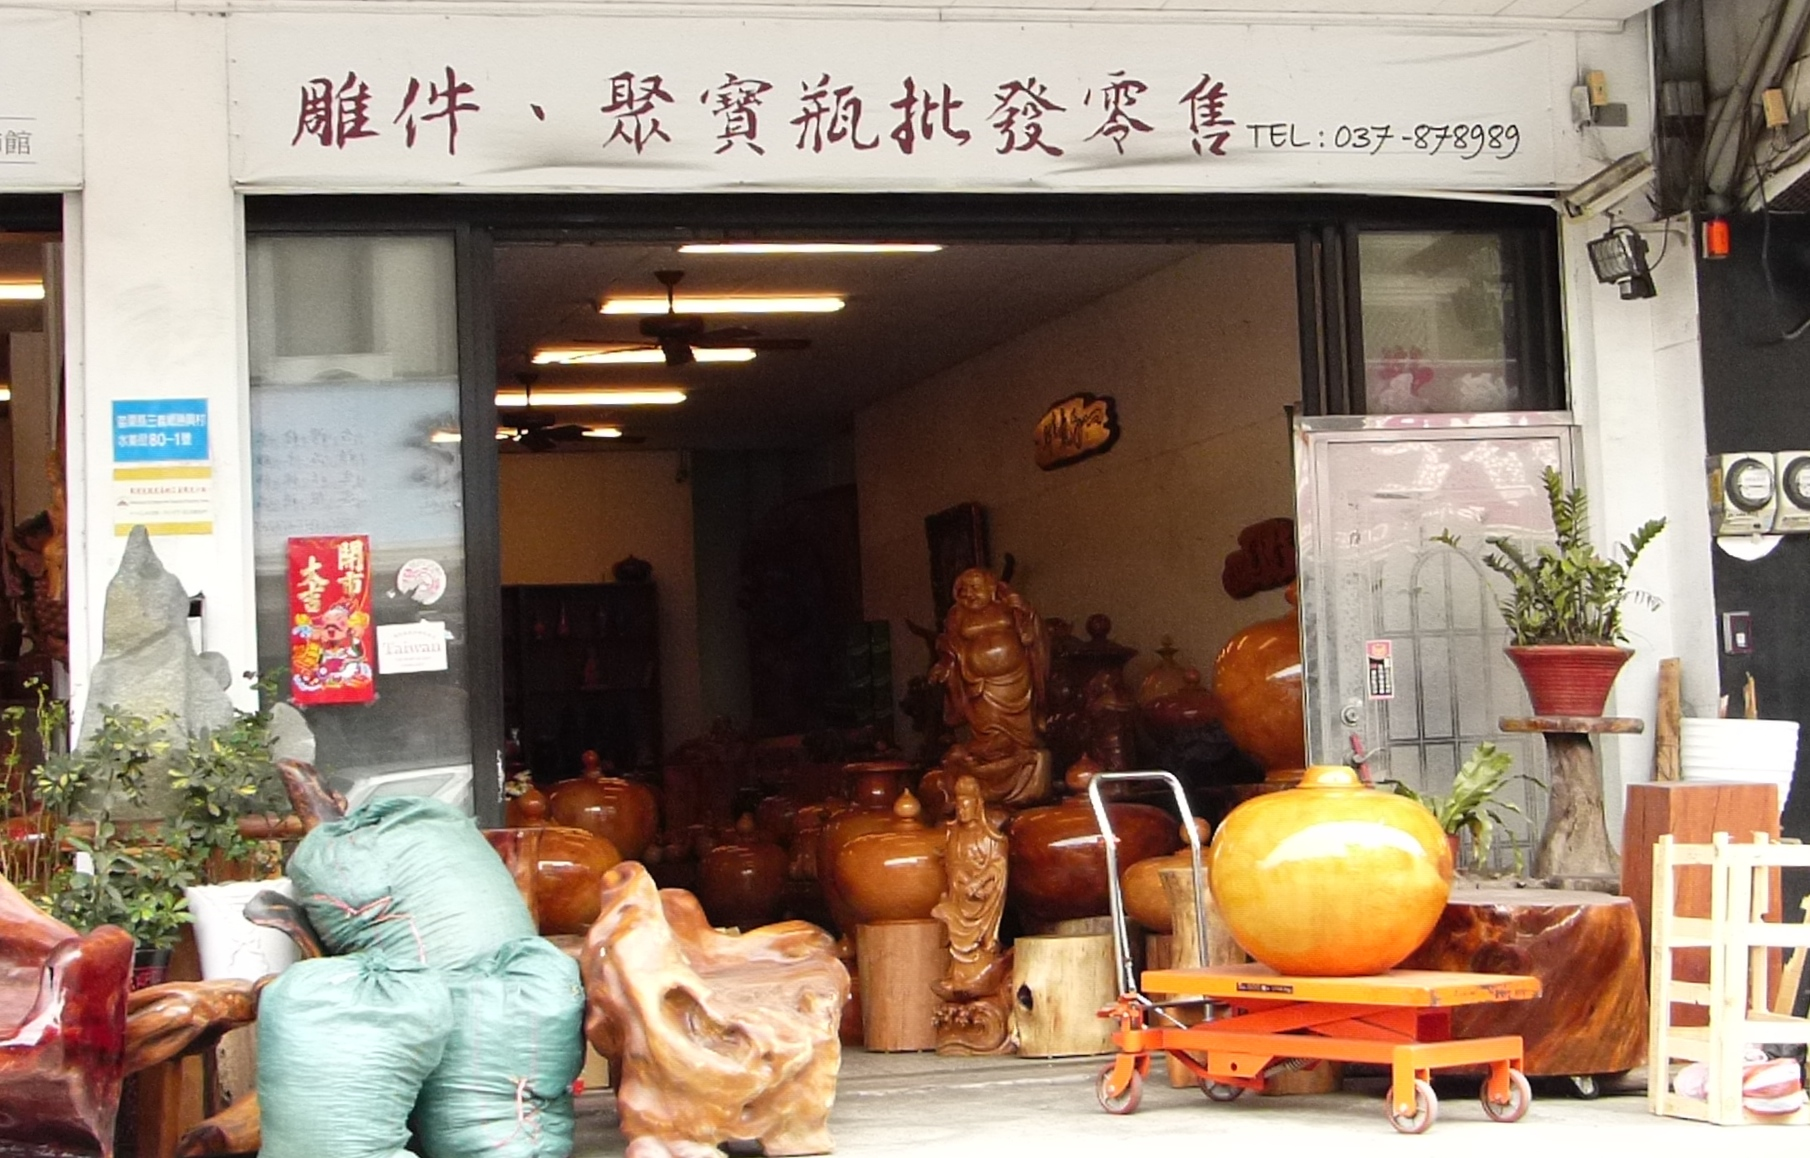 Woodcarving retailer/wholesaler in Sanyi